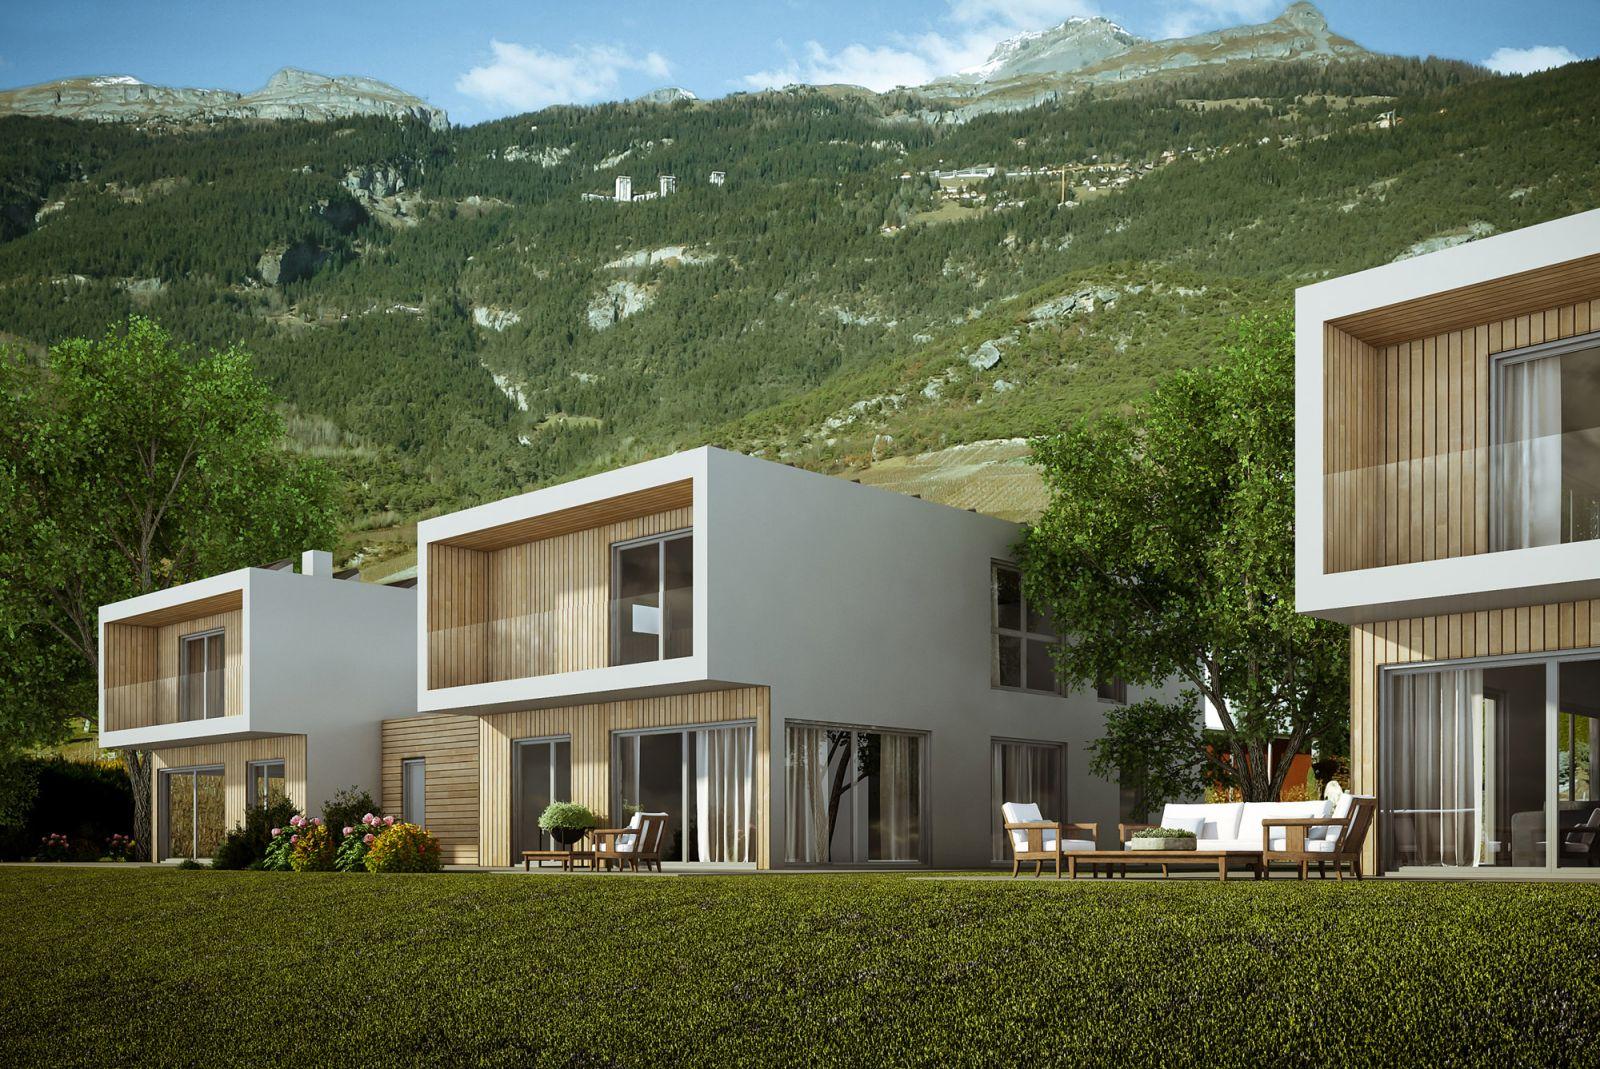 Miege Housing 485